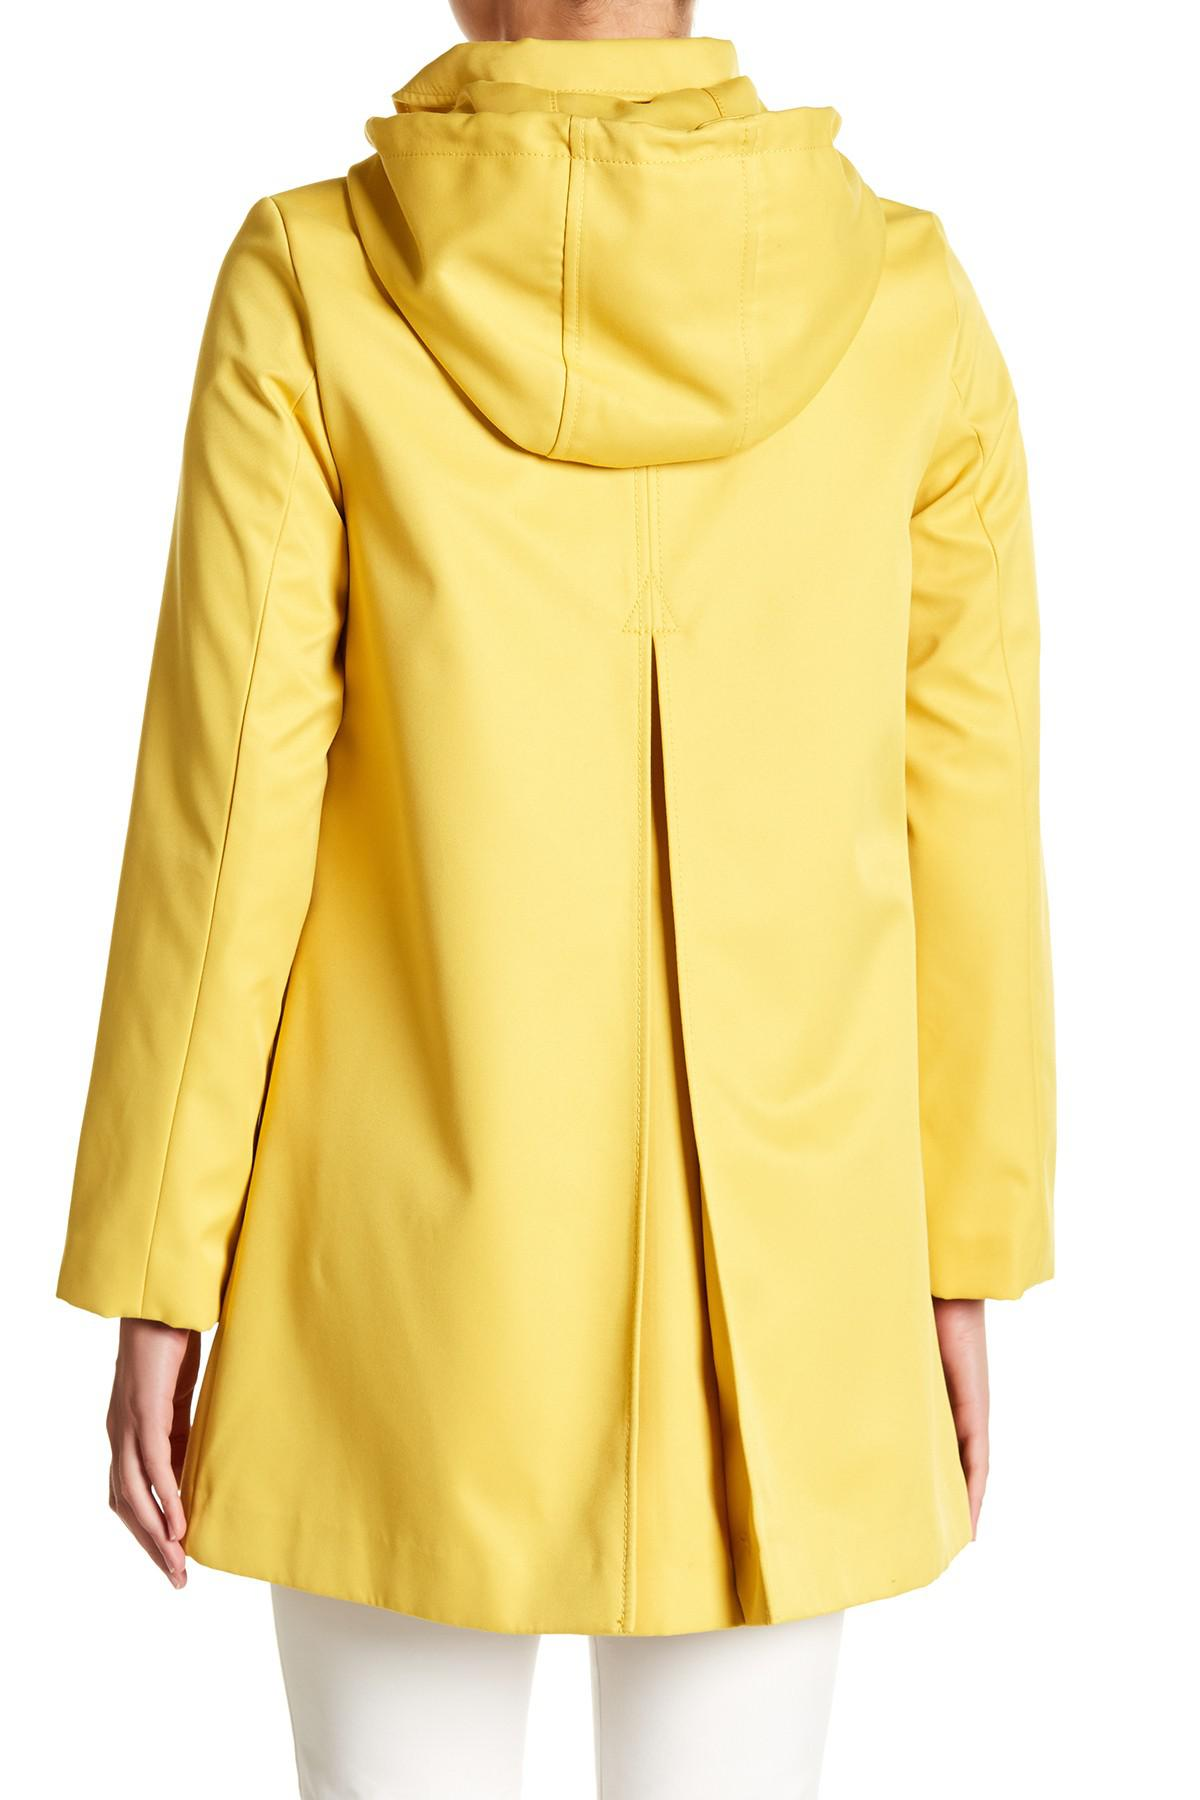 0cc79199a5b2 Lyst - Kate Spade Scallop Edge Raincoat in Yellow